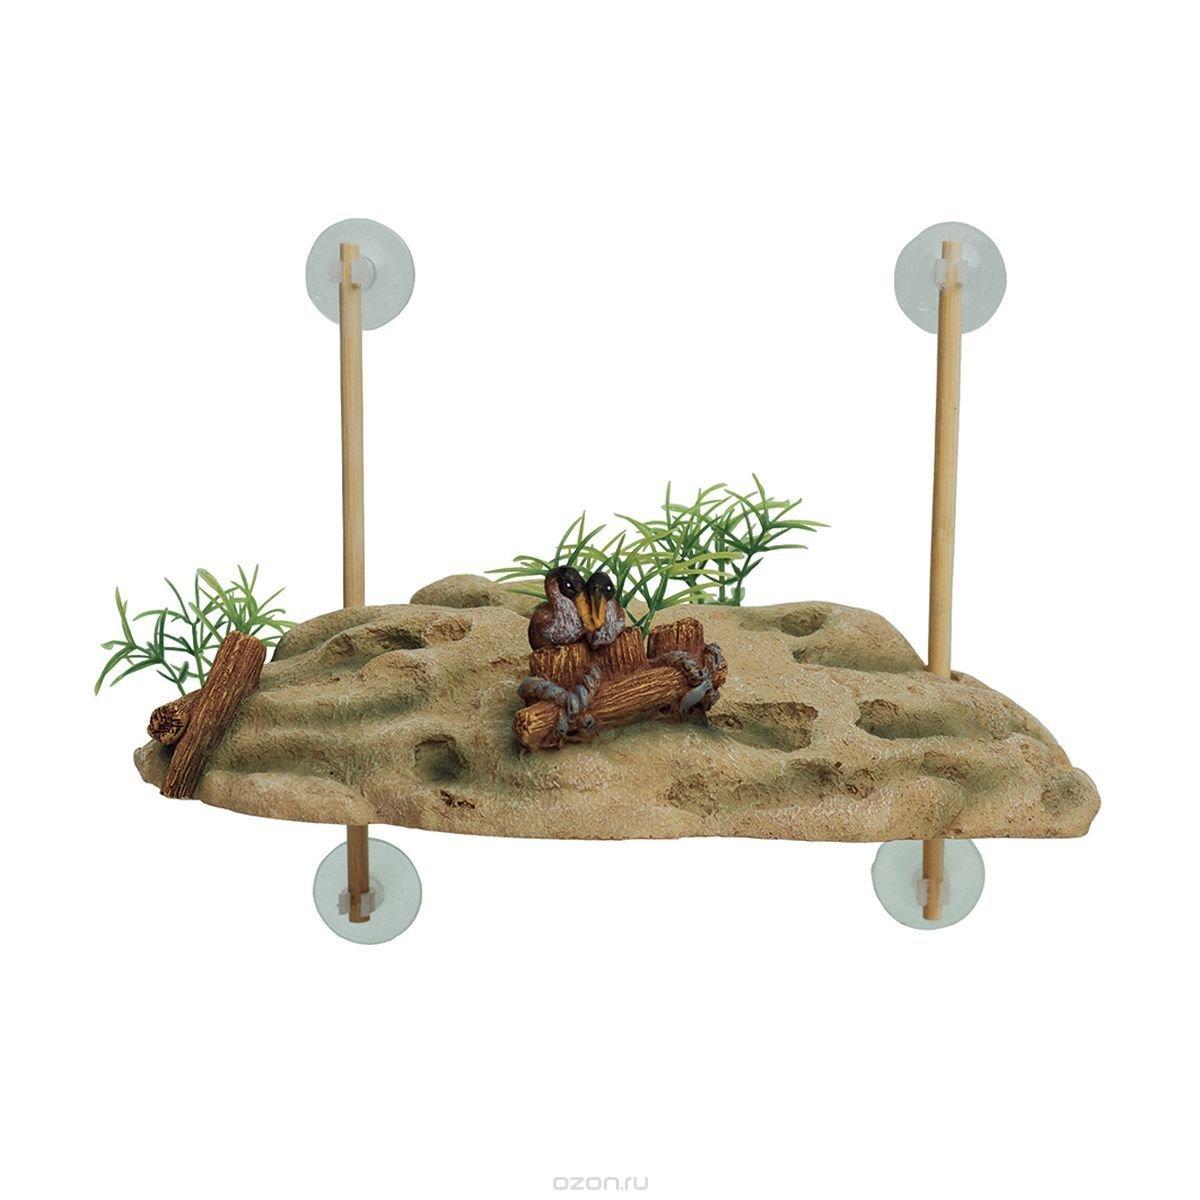 "Декорация для аквариума ArtUniq ""Островок для черепах"", на присосках, 24,5 x 11,5 x 7,5 см"